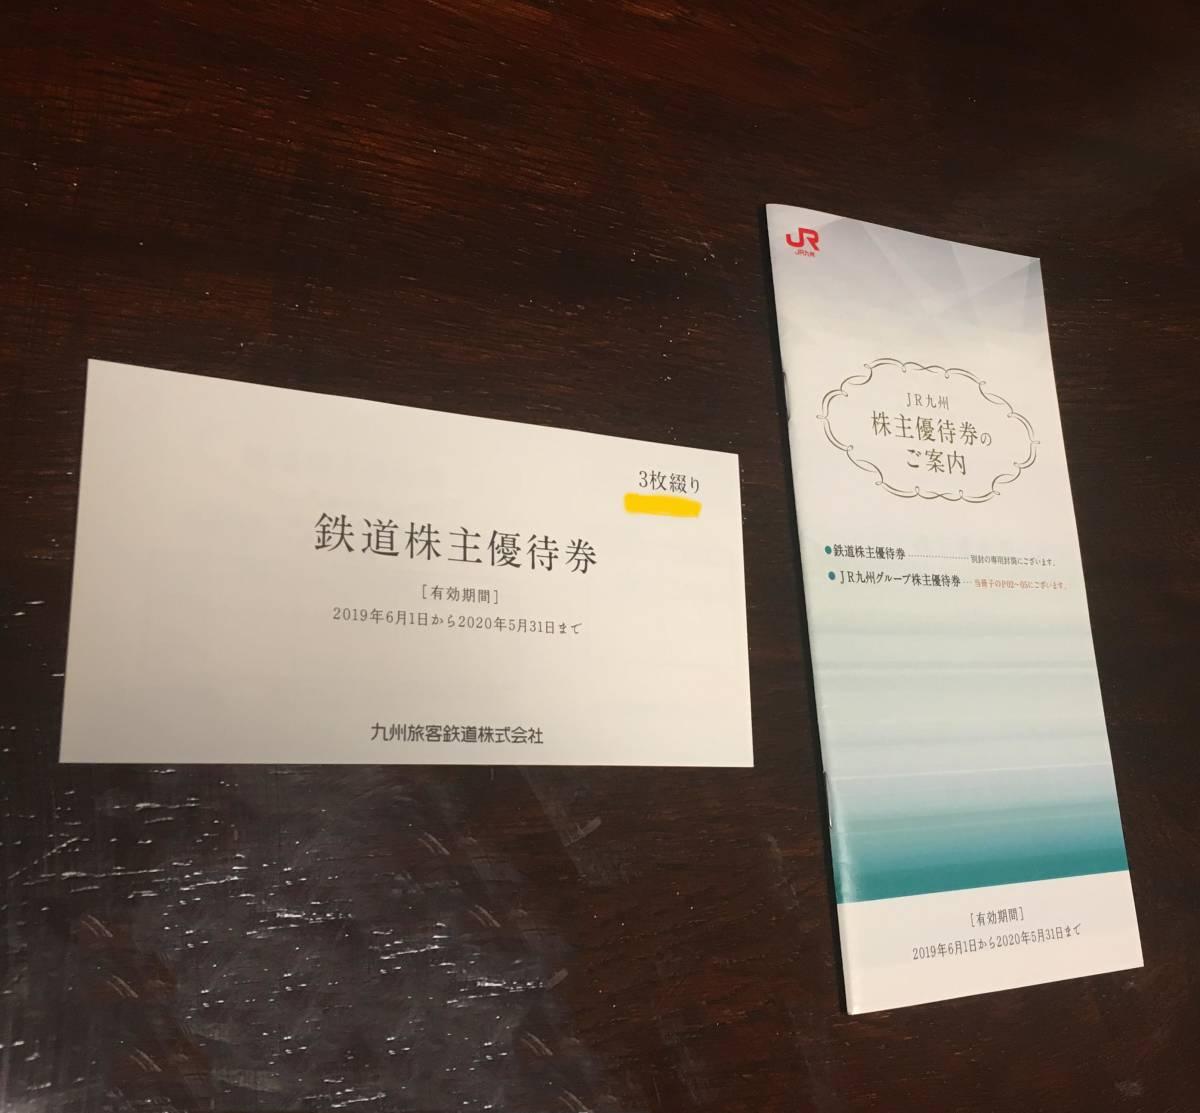 JR九州 鉄道株主優待券3枚+JR九州グループ株主優待券1冊